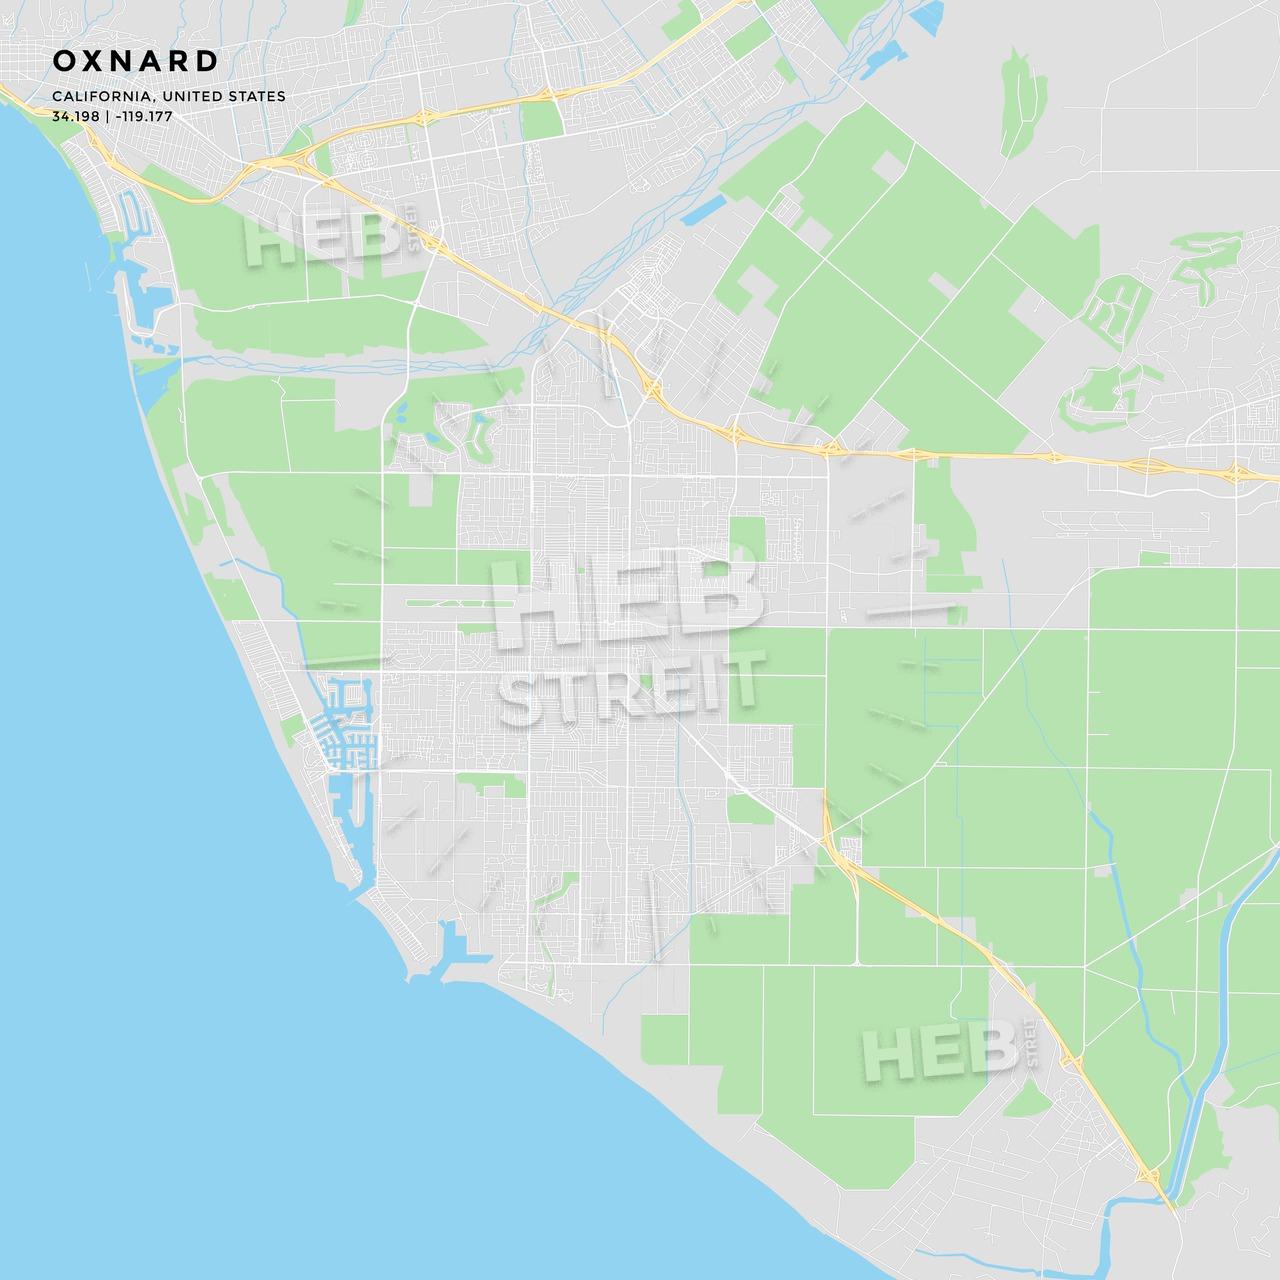 Oxnard California Map - Google Maps Oxnard California